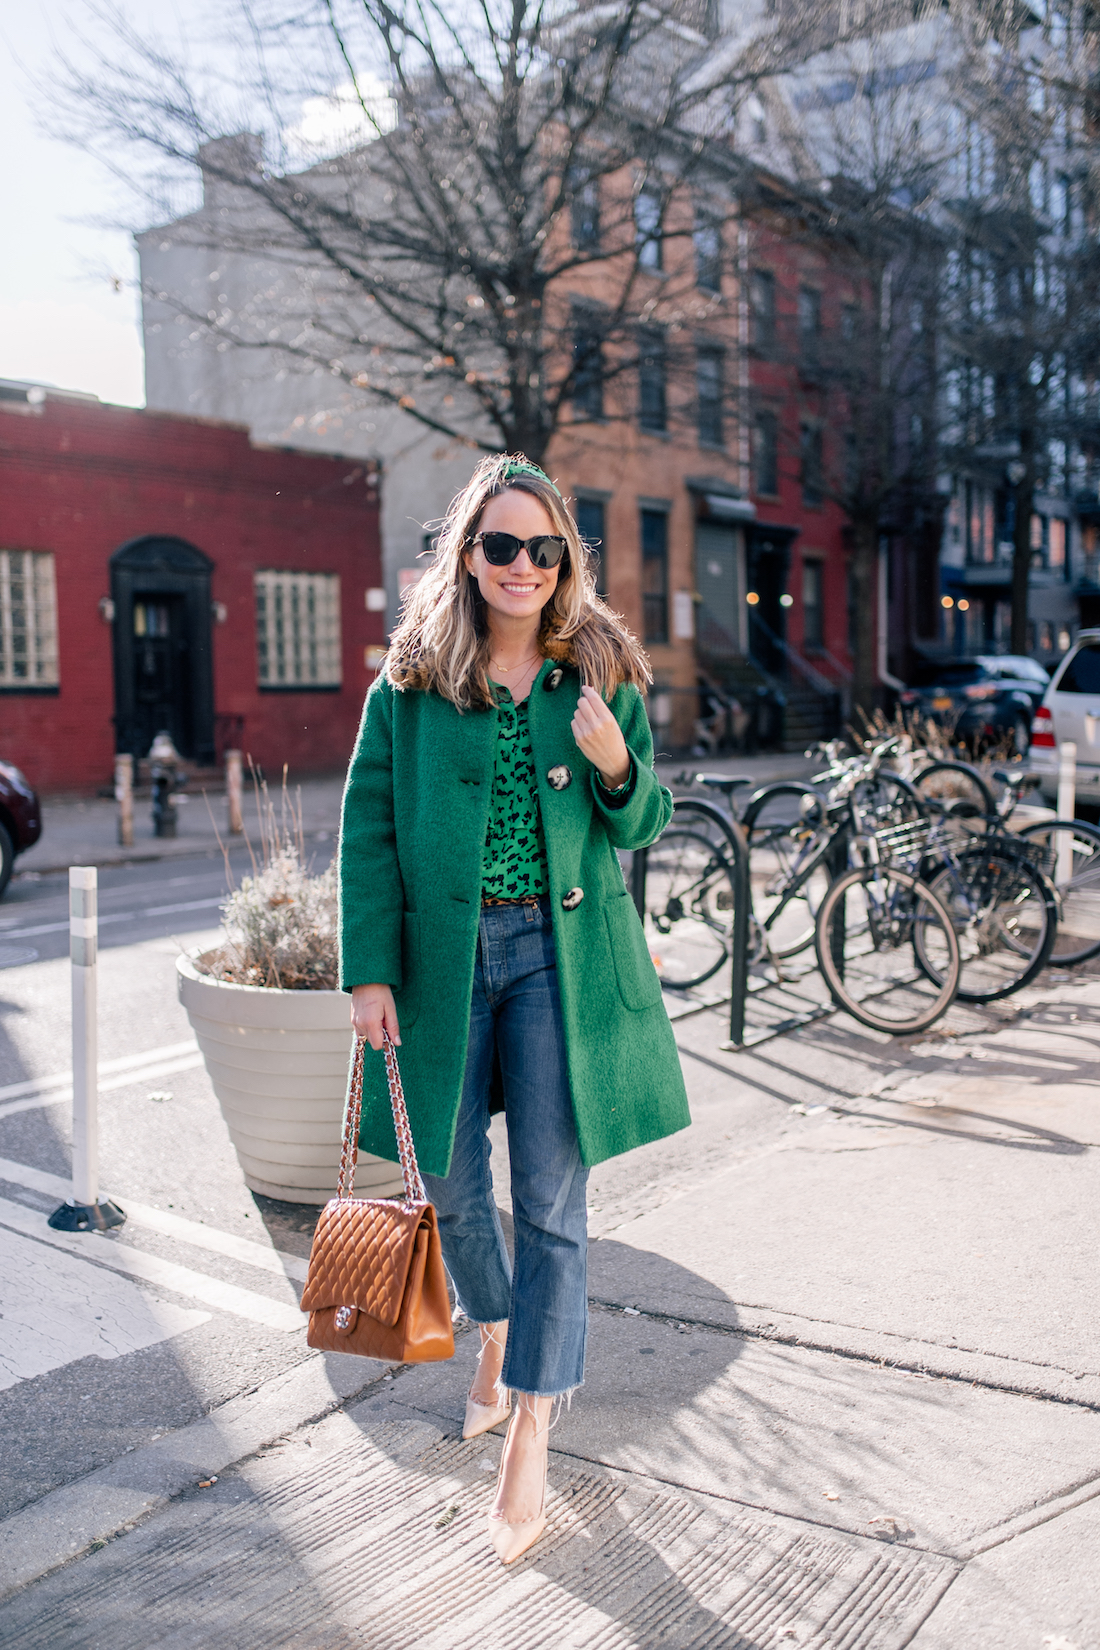 Outfit Details: L.K. Bennett Coat // Tanya Taylor Headband // Re/Done Jeans // Manolo Blahnik Pumps // Chanel Purse // Polaroid Sunglasses